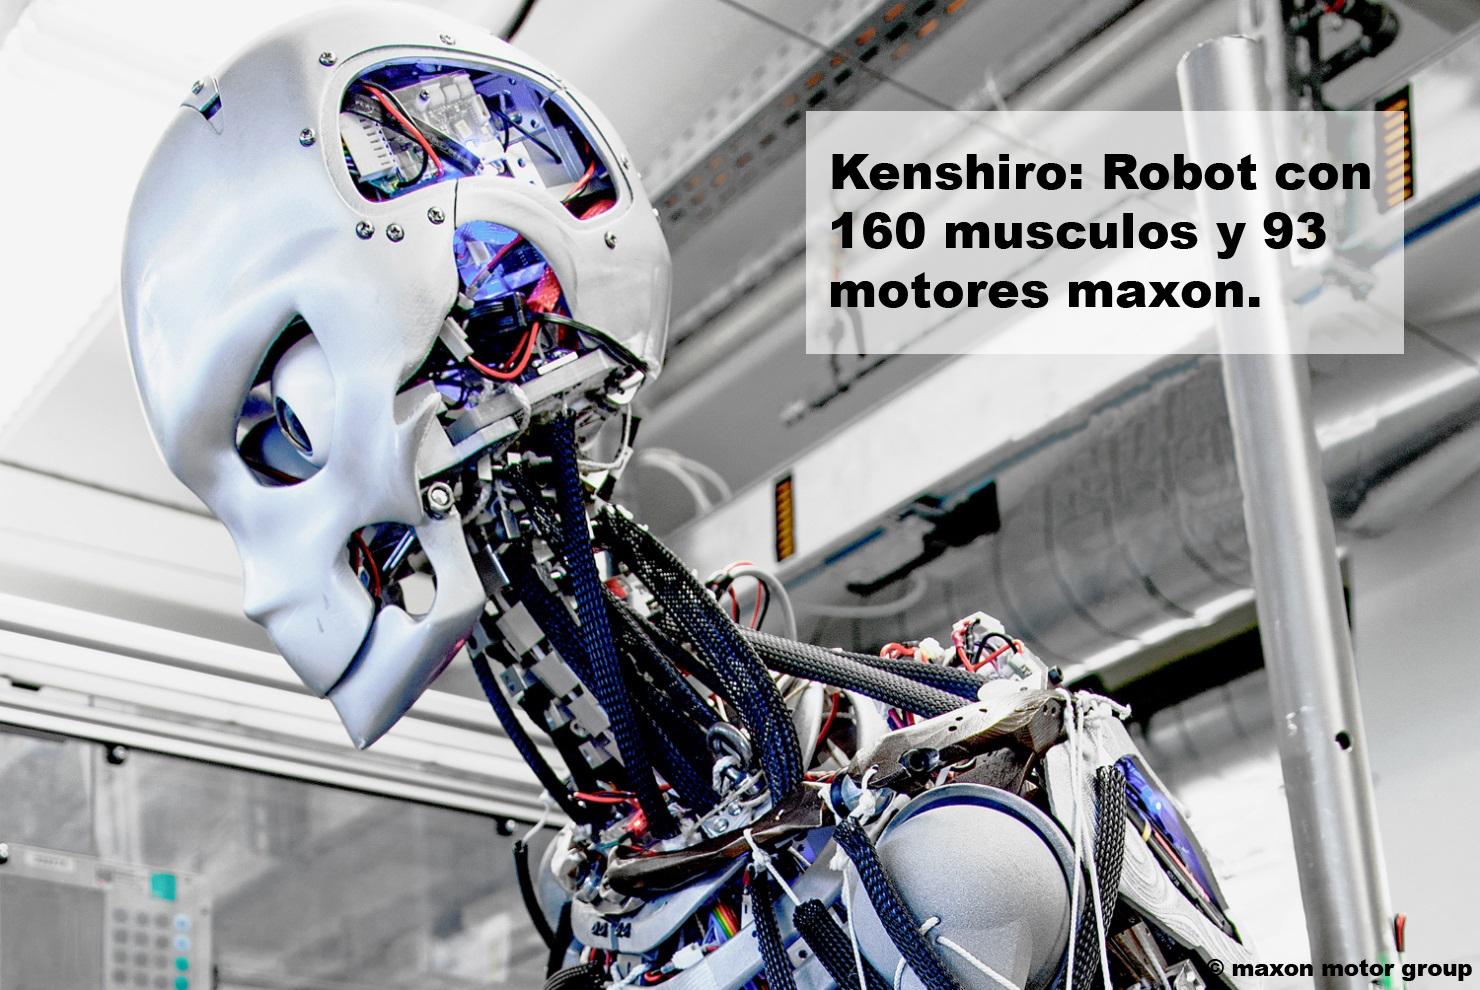 motores-cc-robot-kenshiro